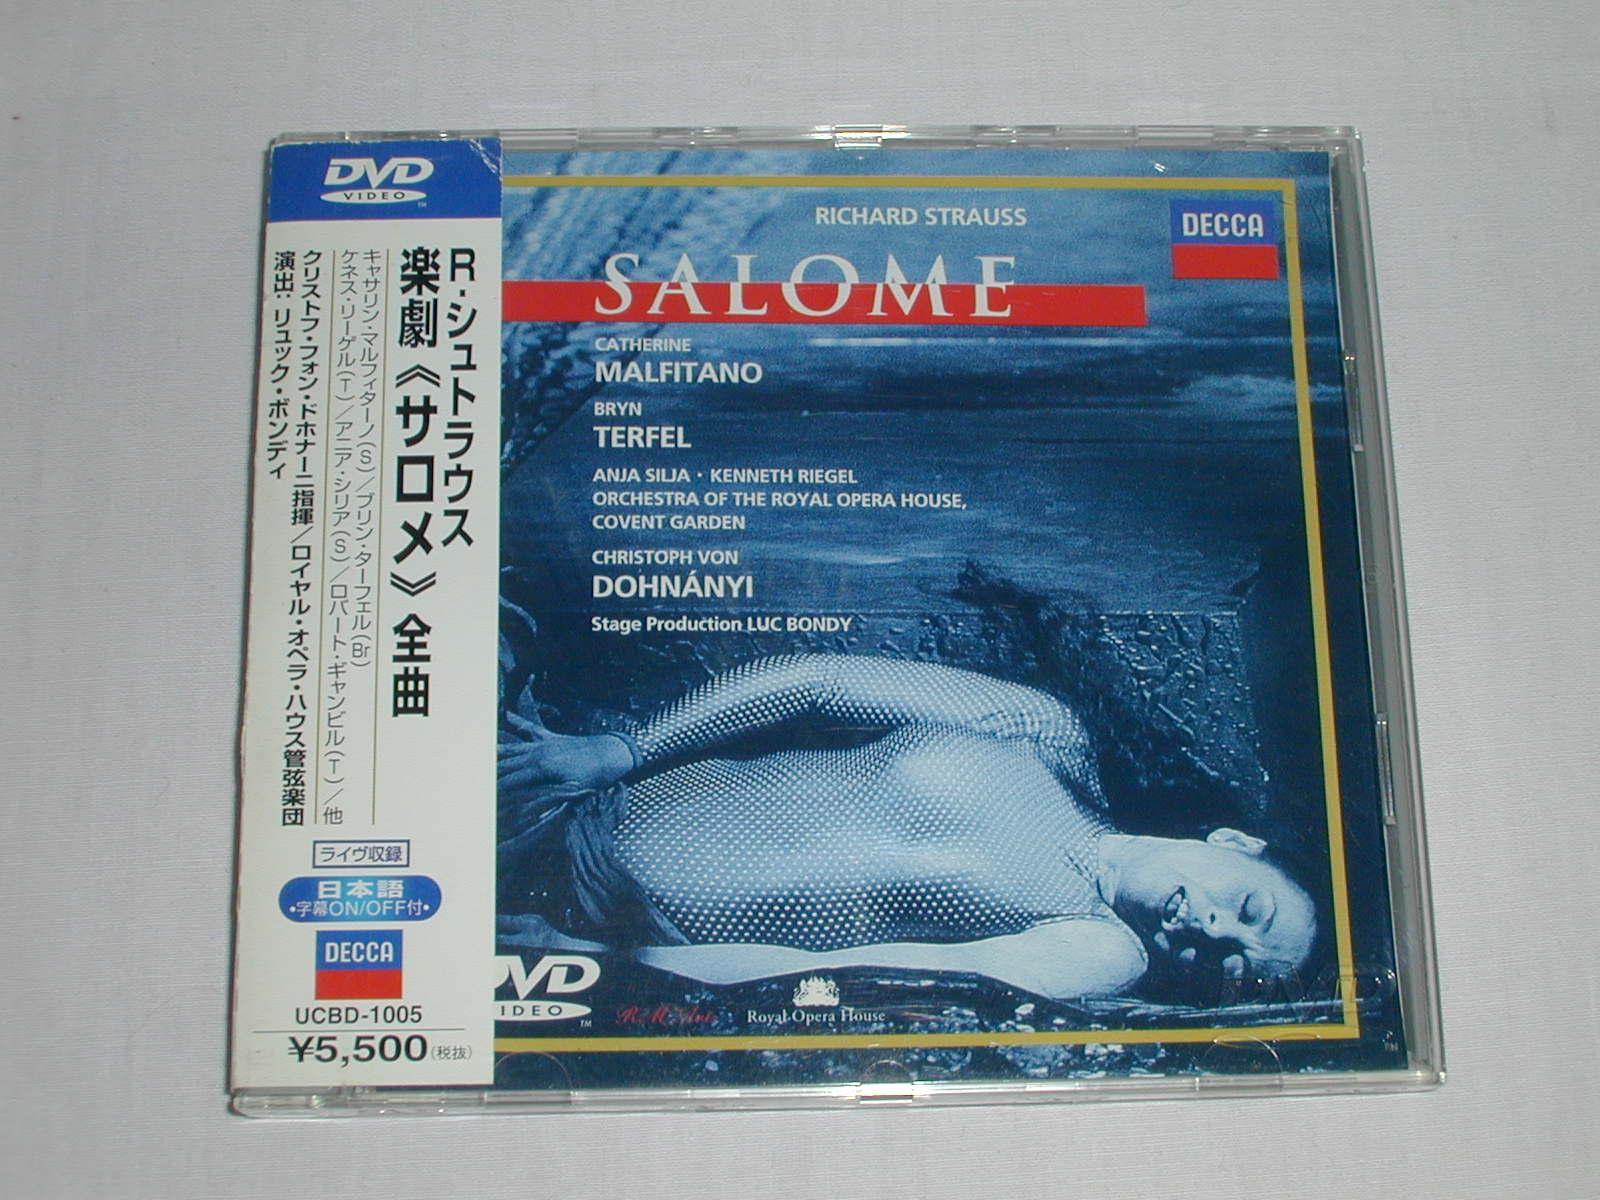 (DVD)R・シュトラウス 歌劇≪サロメ≫ クリストフ・フォン・ドナホーニ指揮